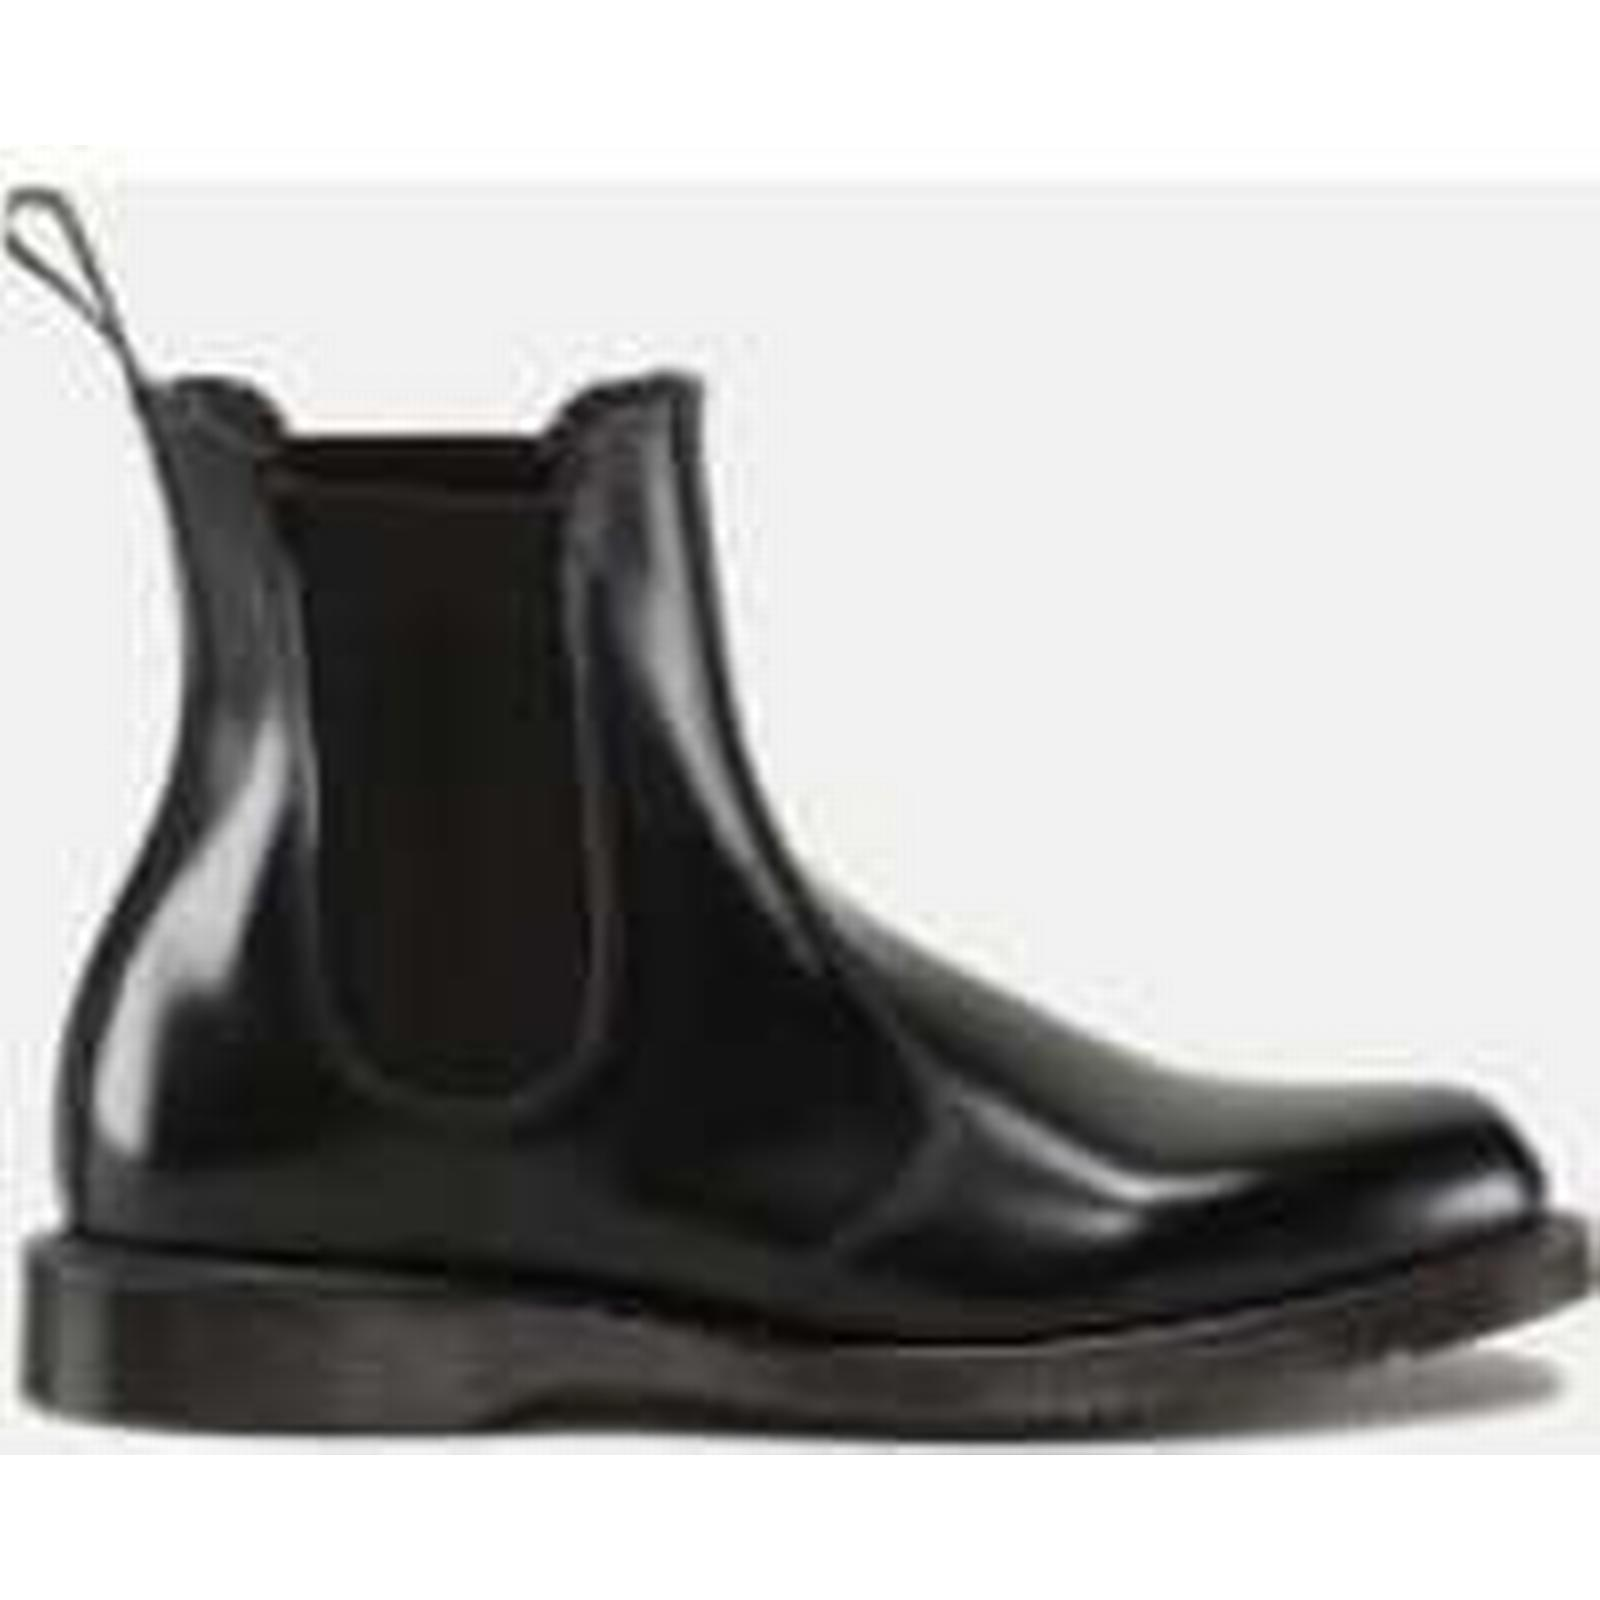 Dr. Martens Leather Women's Flora Polished Smooth Leather Martens Chelsea Boots - Black - UK 8 - Black 409fed